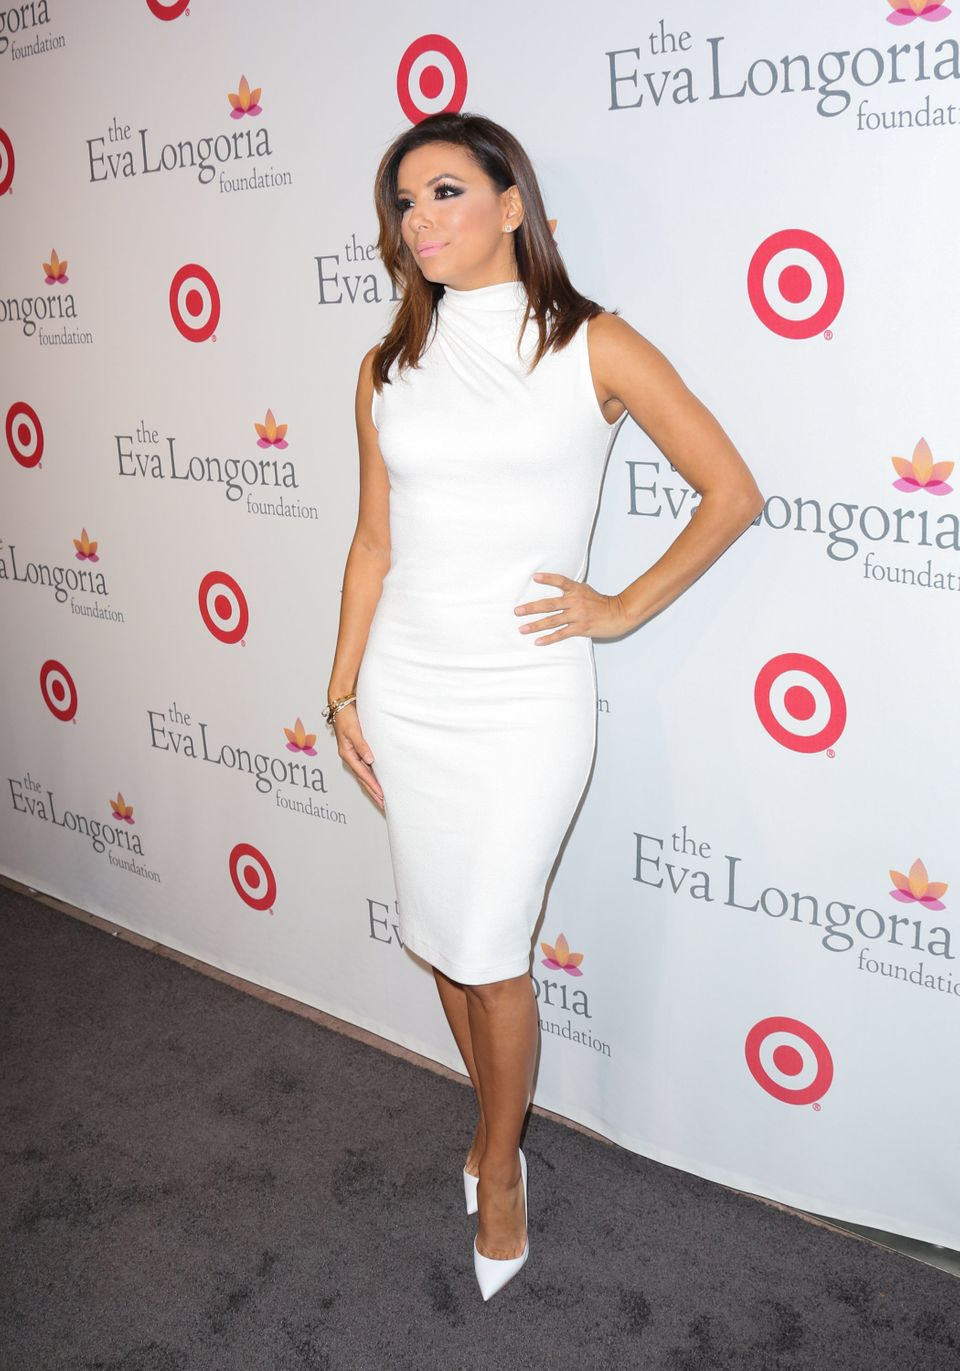 Eva Longoria attends The Eva Longoria Foundation annual dinner at Beso on November 5, 2015 in Hollywood,